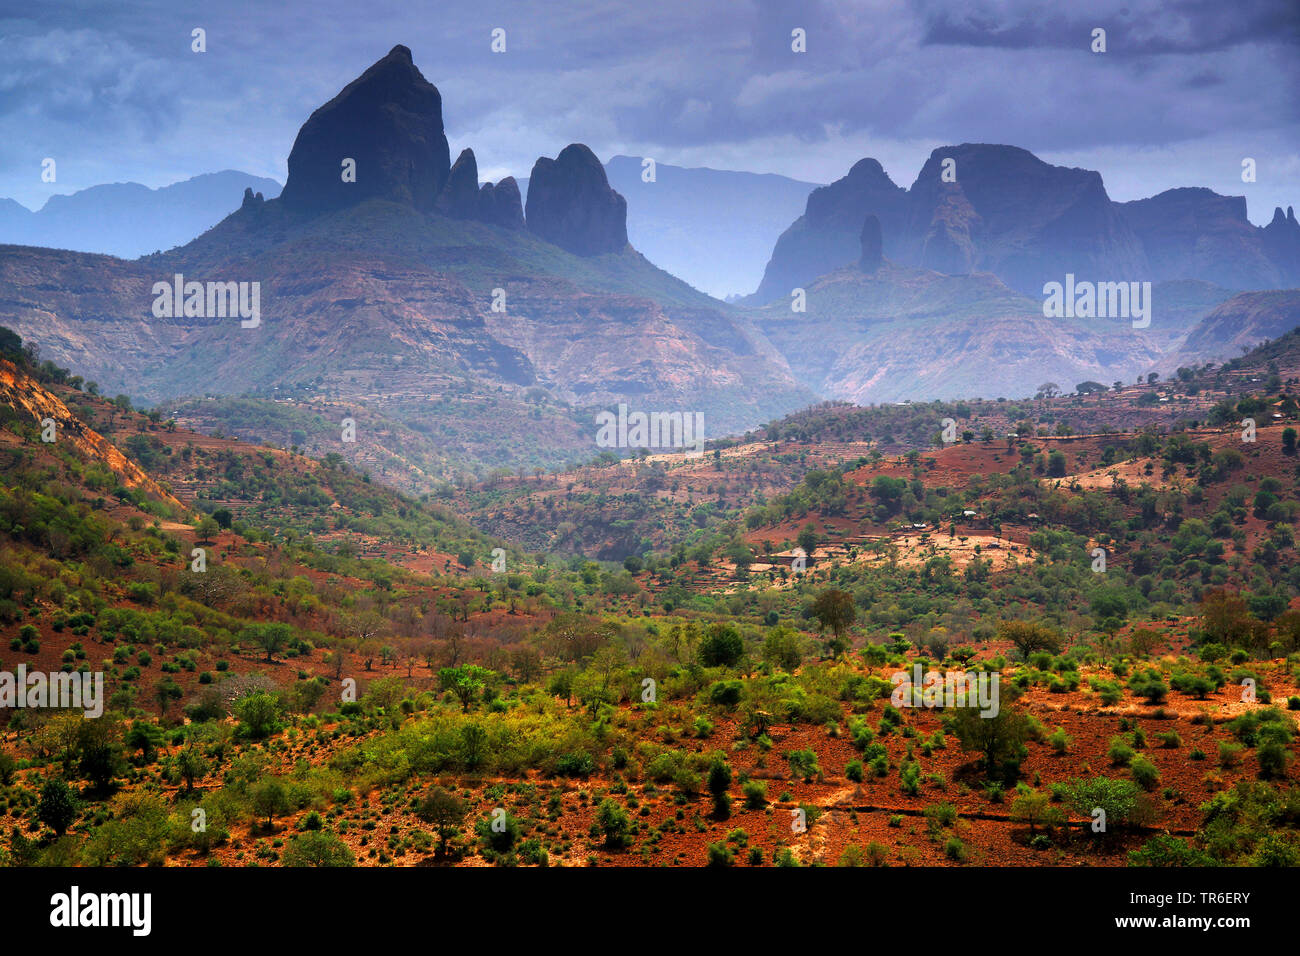 Simien-Gebirge, Aethiopien   Semien Mountains, Ethiopia   BLWS482364.jpg [ (c) blickwinkel/McPHOTO/S. Wolf-Feix Tel. +49 (0)2302-2793220, E-mail: info - Stock Image